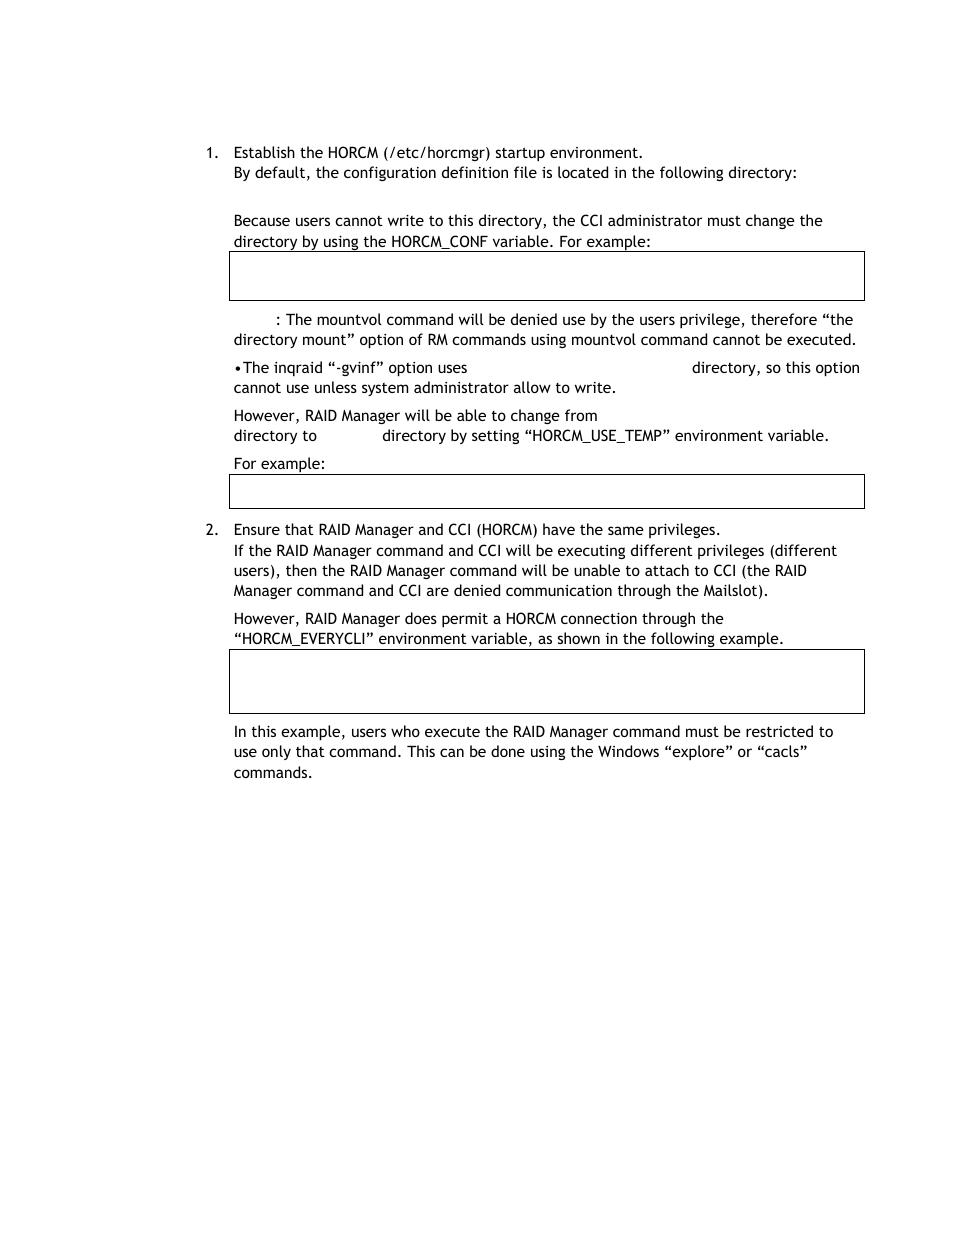 hitachi tagmastore mk 90rd011 25 user manual page 153 388 rh manualsdir com